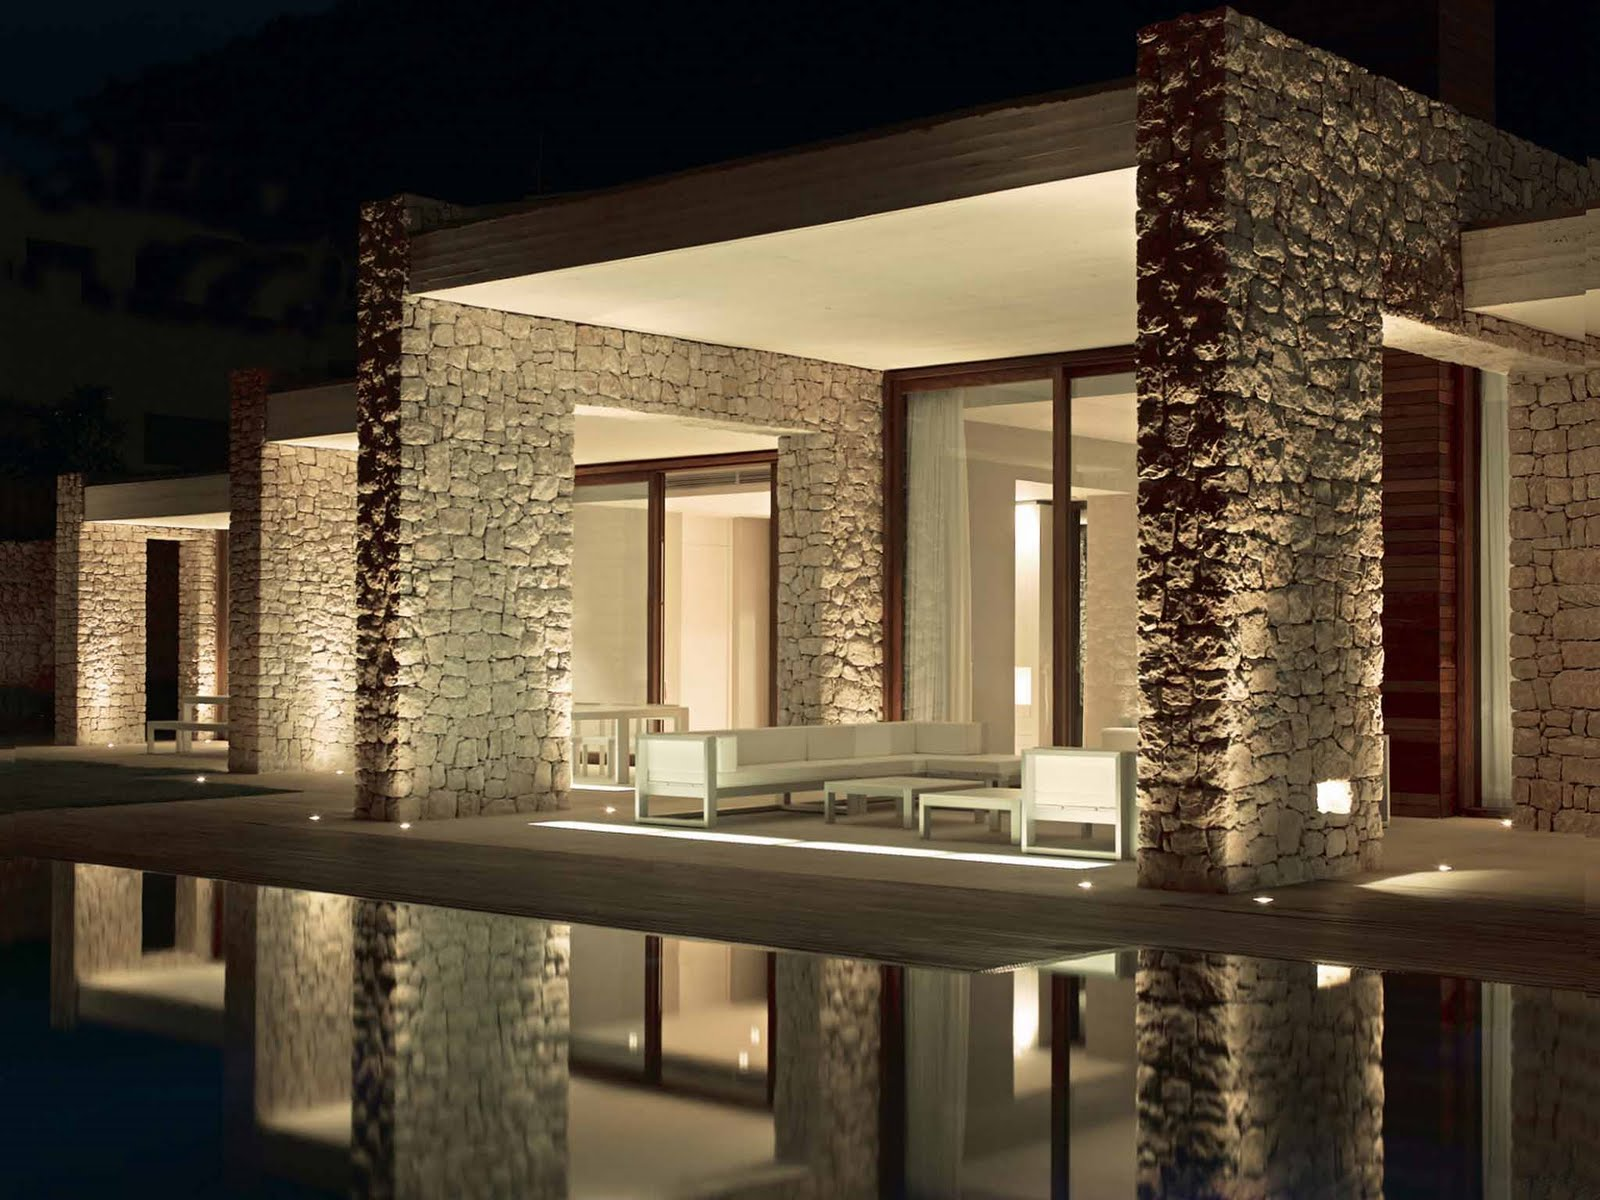 Arquitetura de ilumina o projeto de ilumina o residencial Iluminacion exterior casas modernas